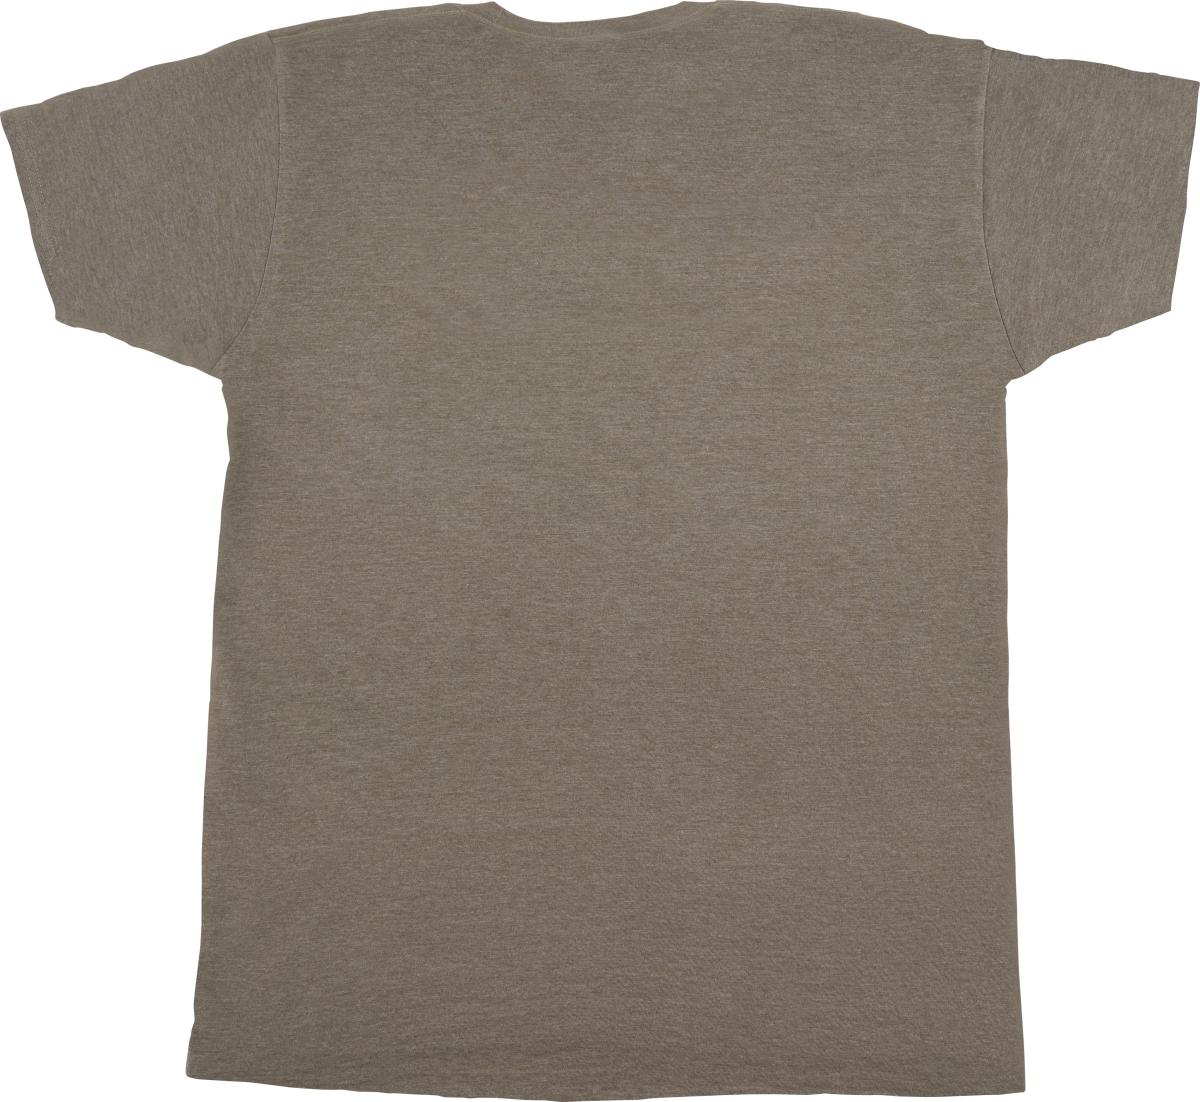 Charvel Charvel® Toothpaste Logo T-Shirt, Heather Green, M